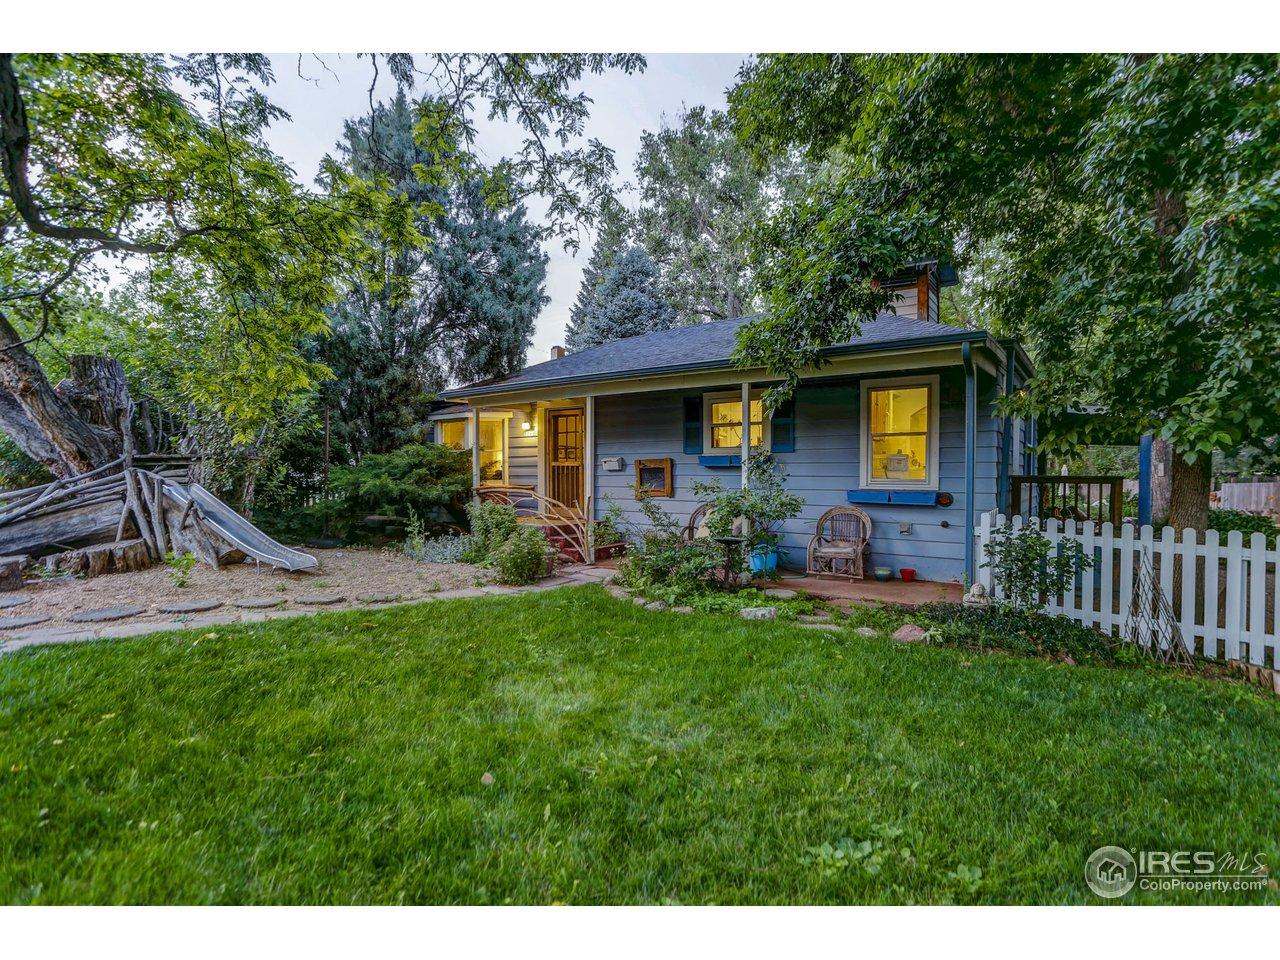 3046 11th St, Boulder CO 80304